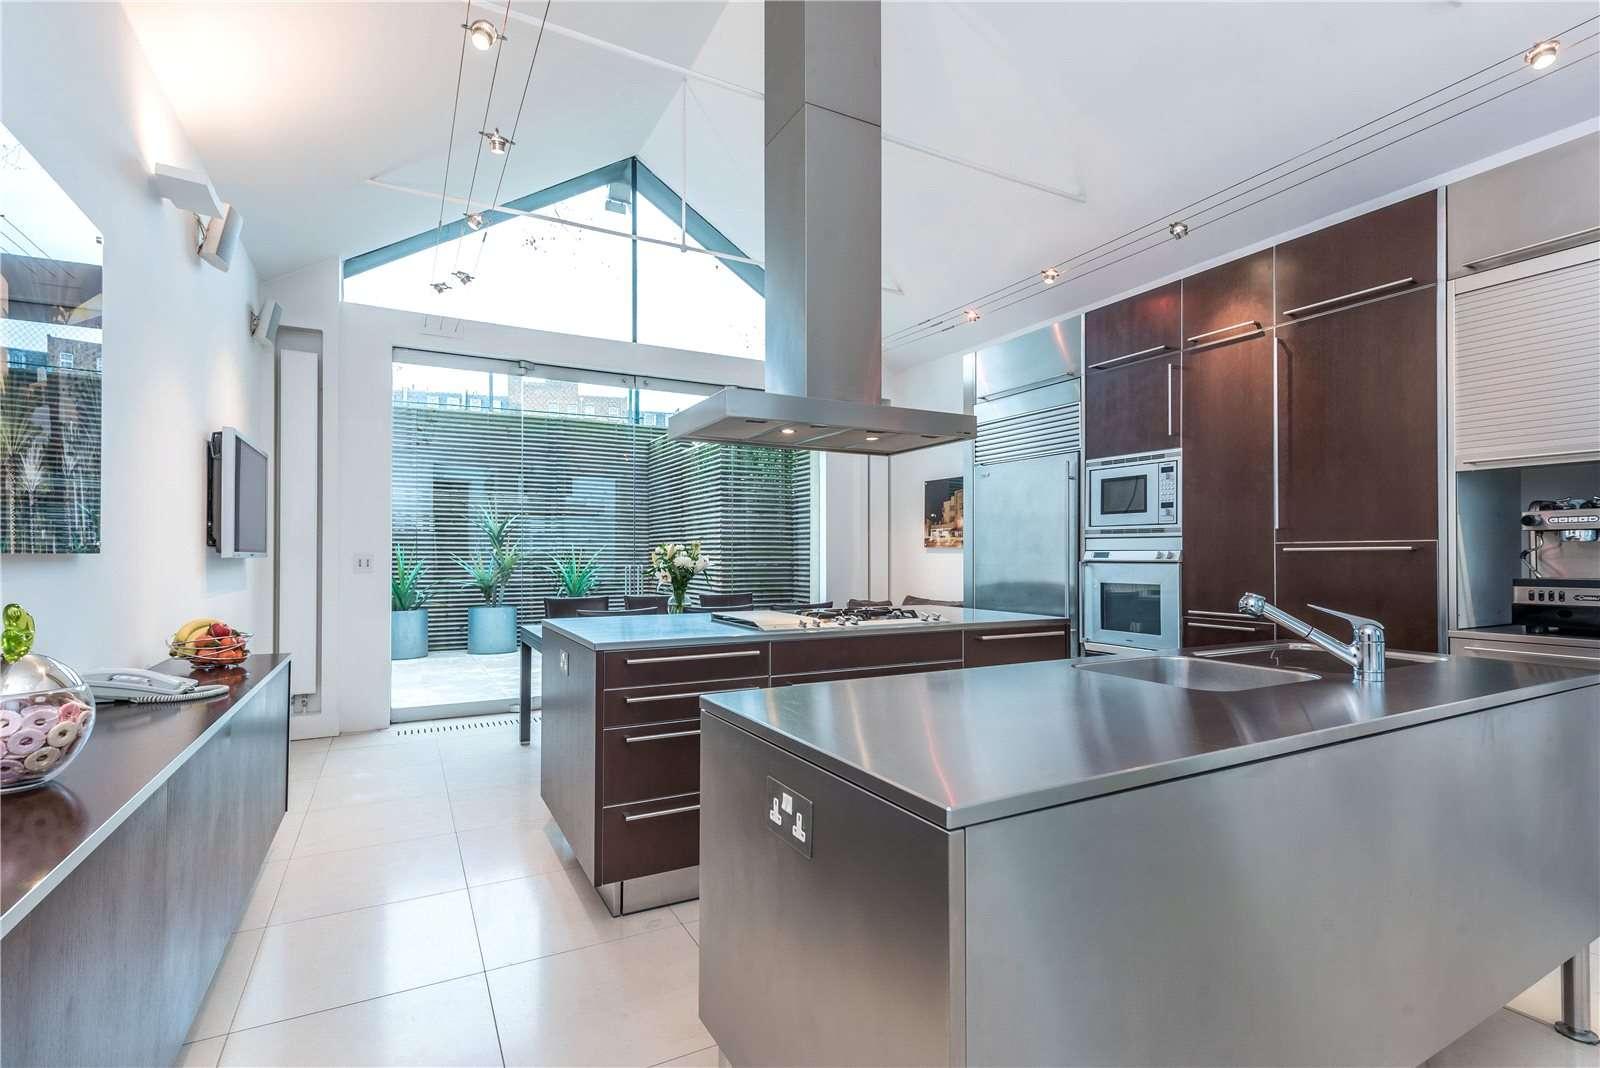 Savills | Duncan Terrace, Islington, London, N1 8AL | Property for sale